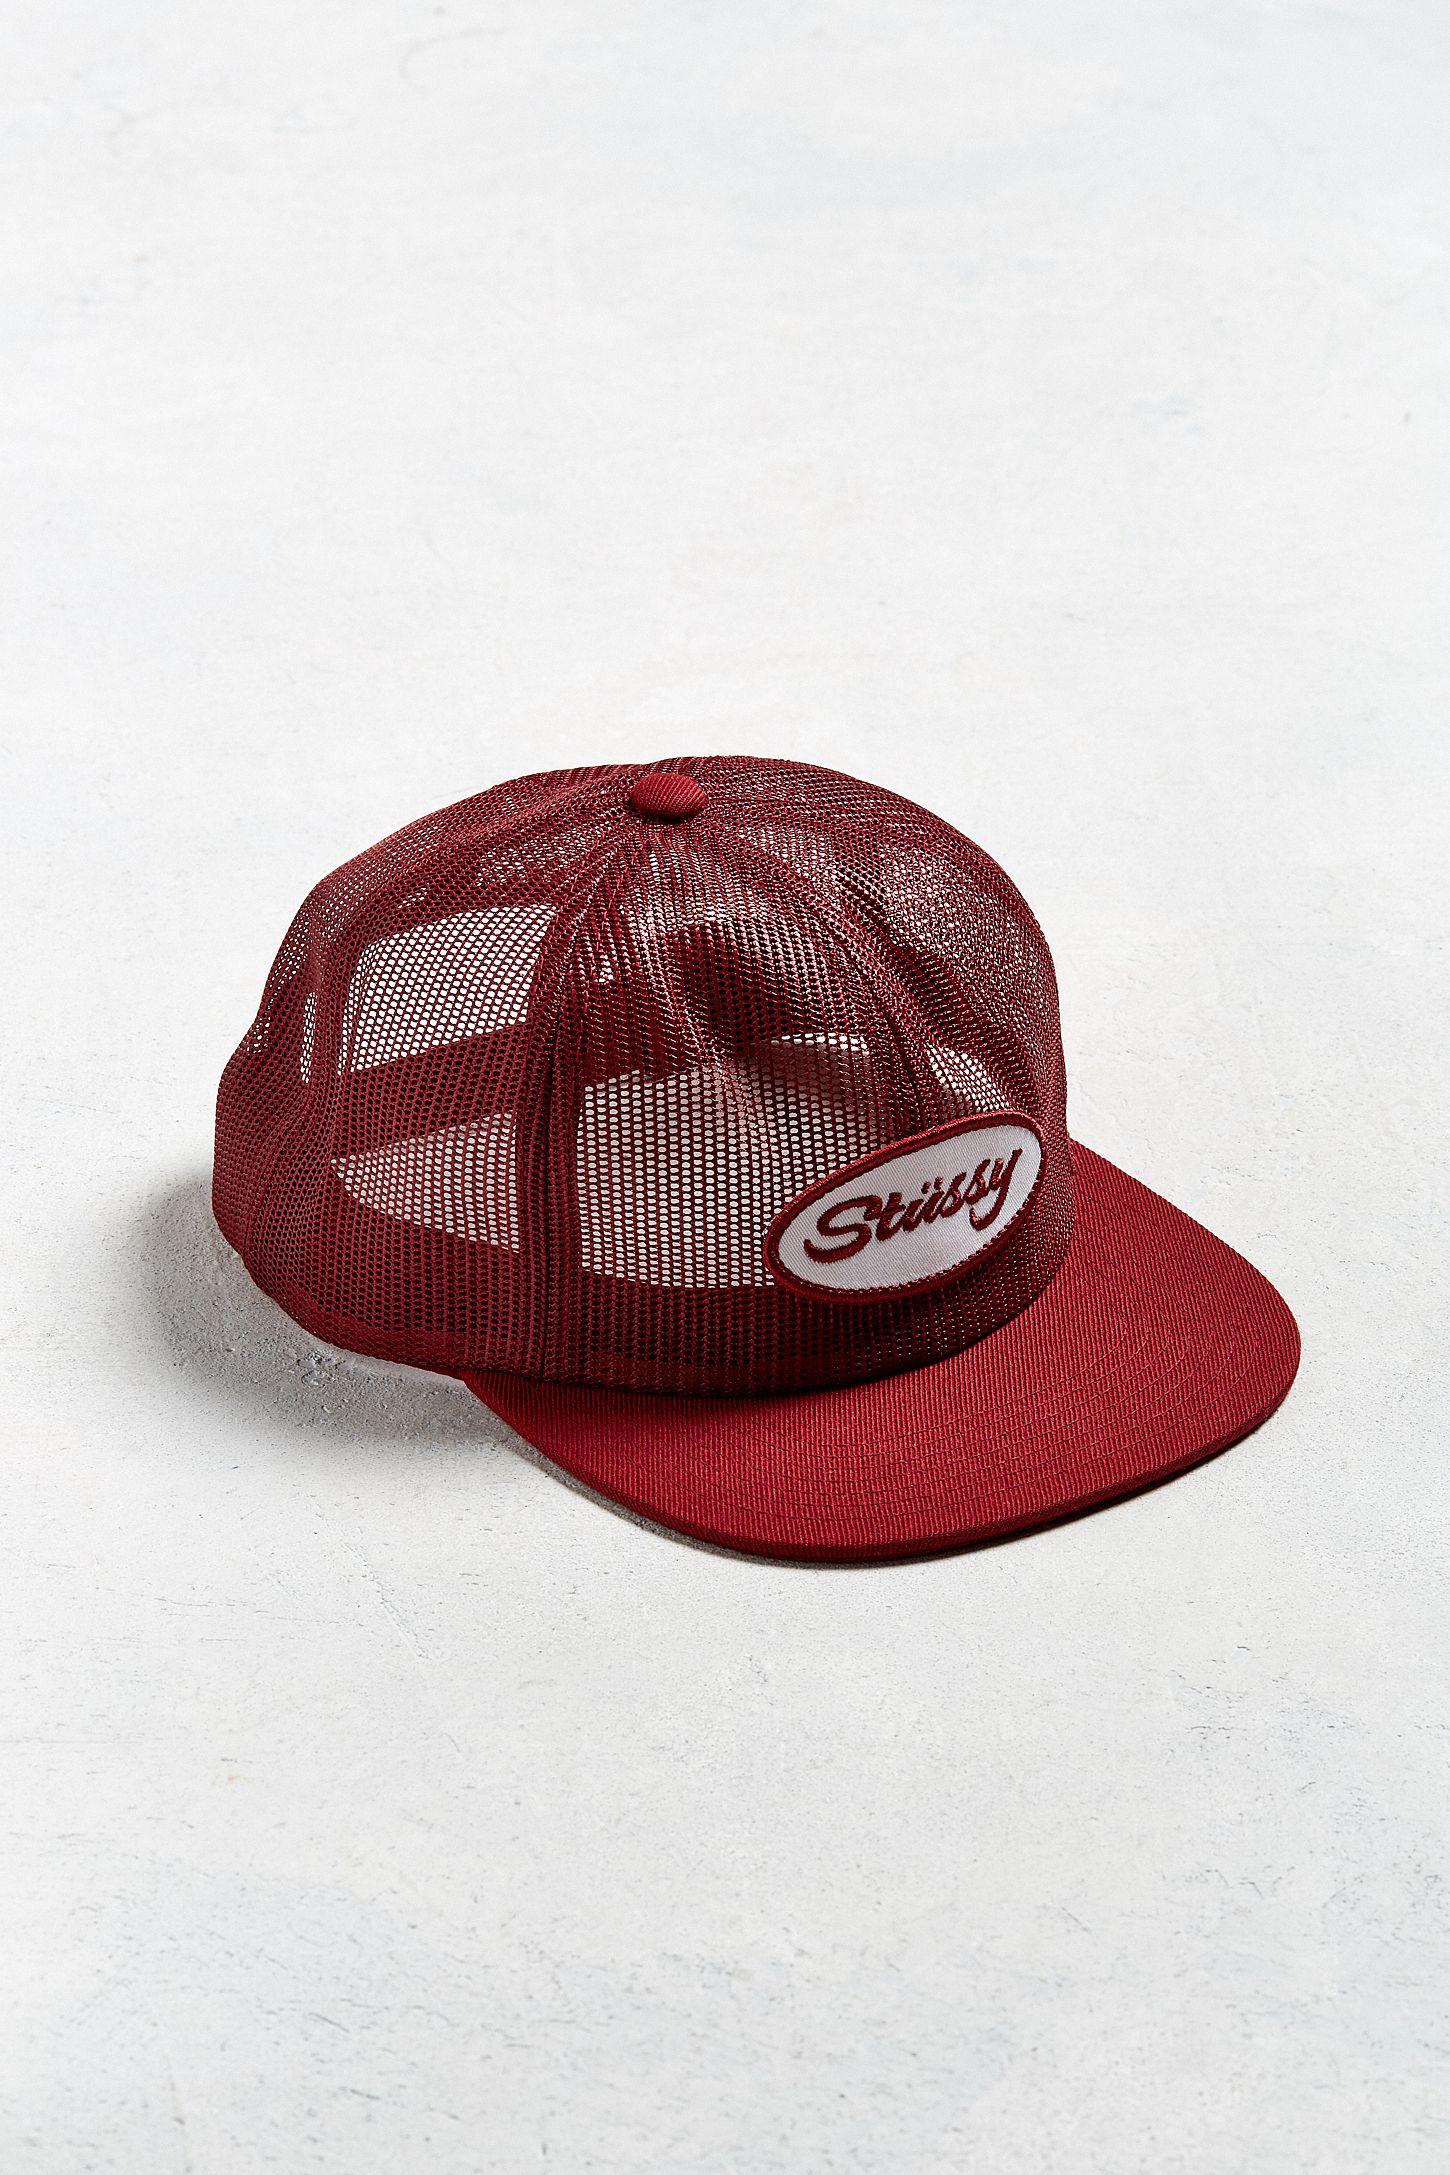 Stussy Full Mesh Trucker Hat  ca6646d8606